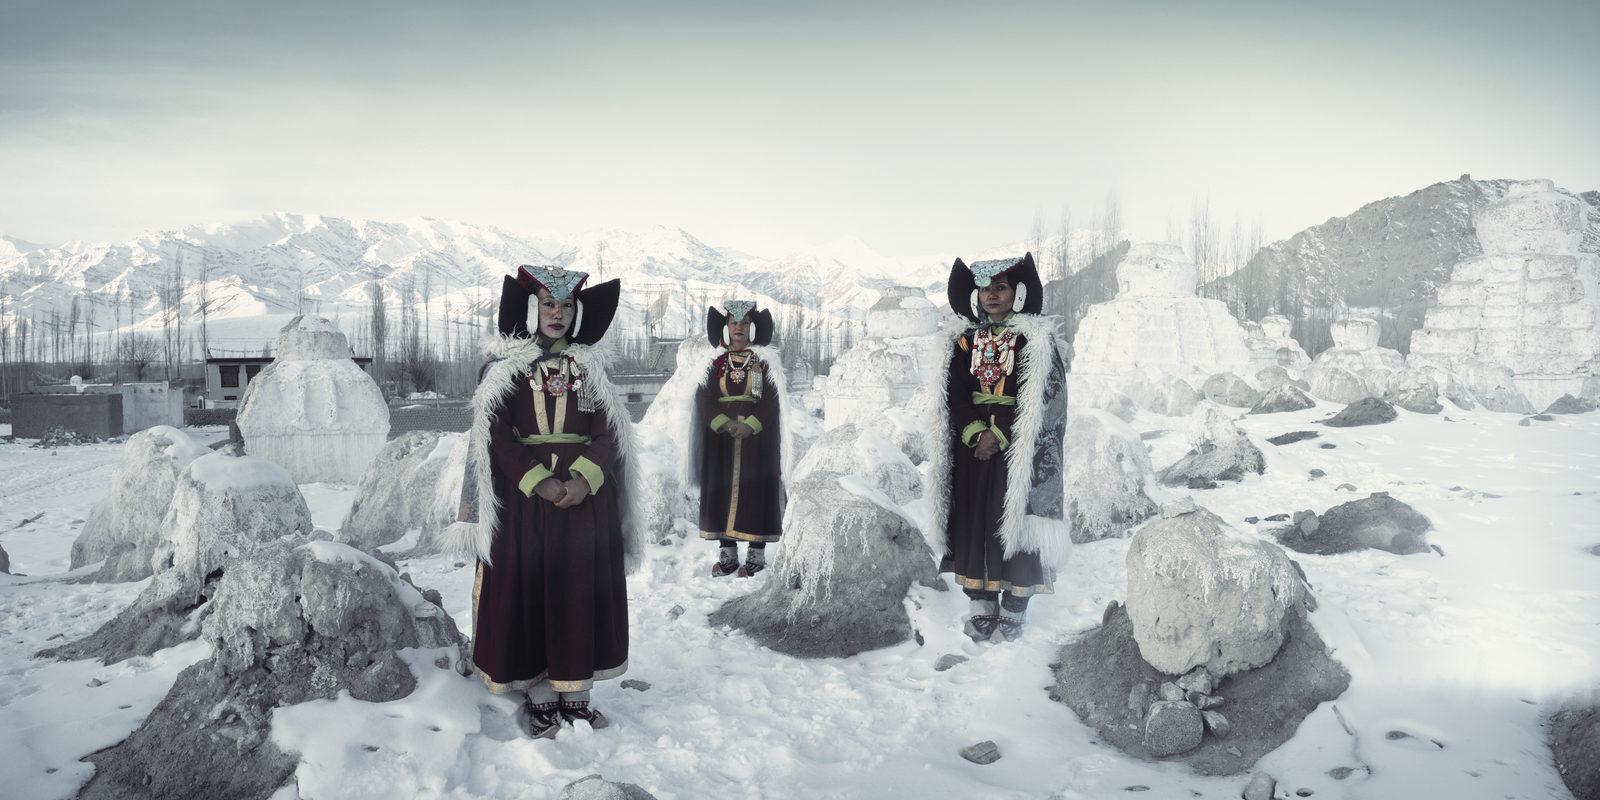 Perak Ladies | Thikse Monastery, Ladakh | India, 2012